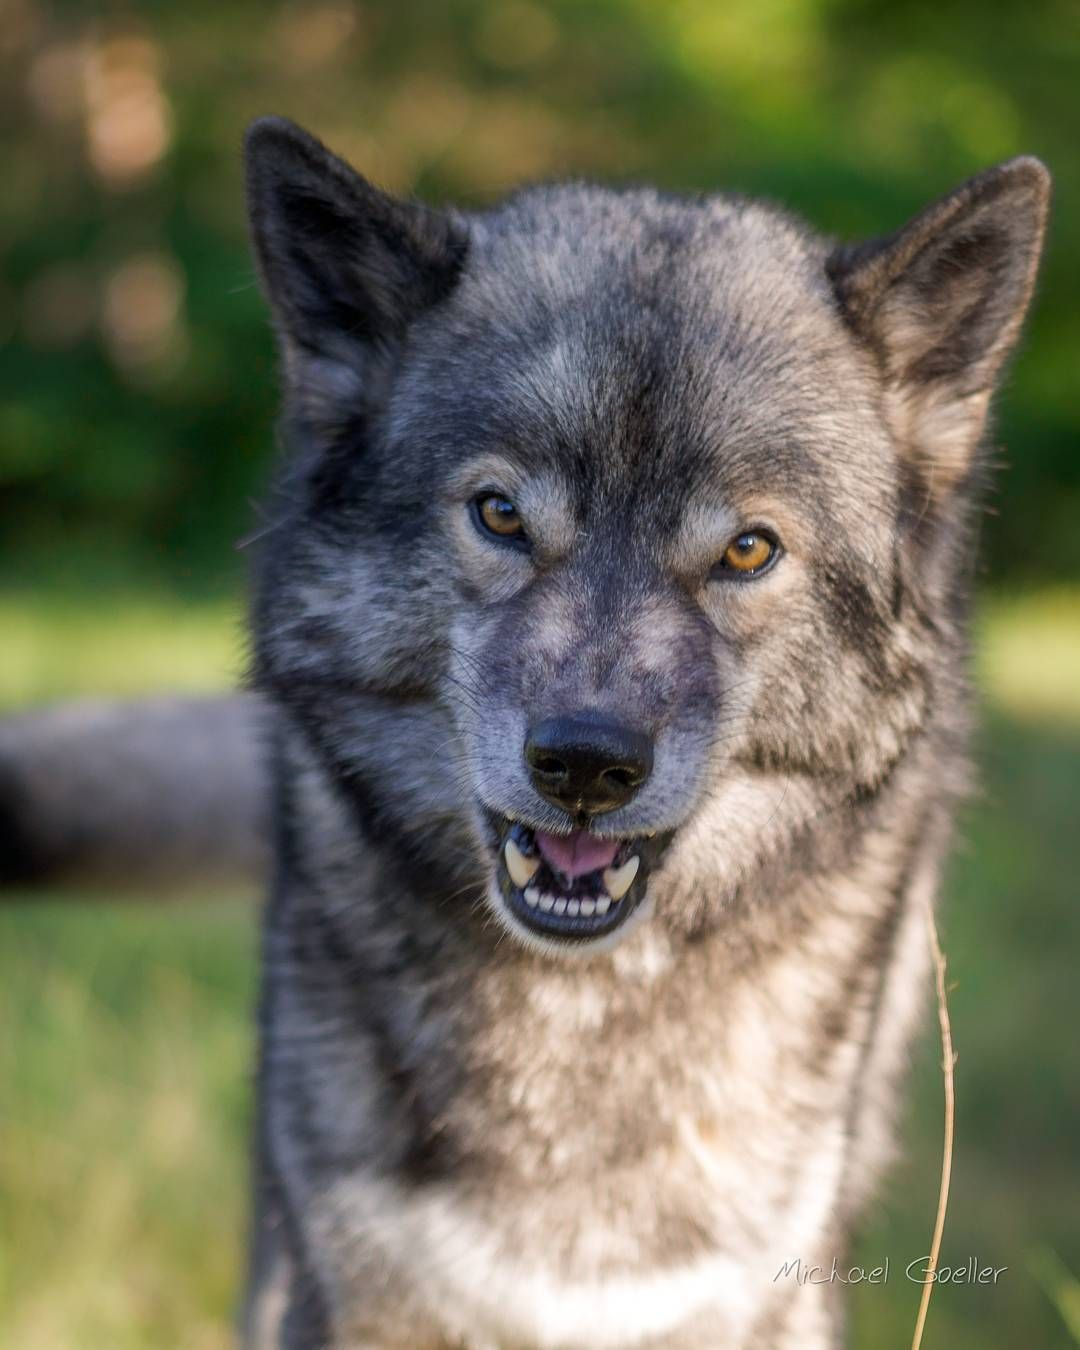 5 334 Curtidas 58 Comentarios Wolf Look Alike Siberian Husky